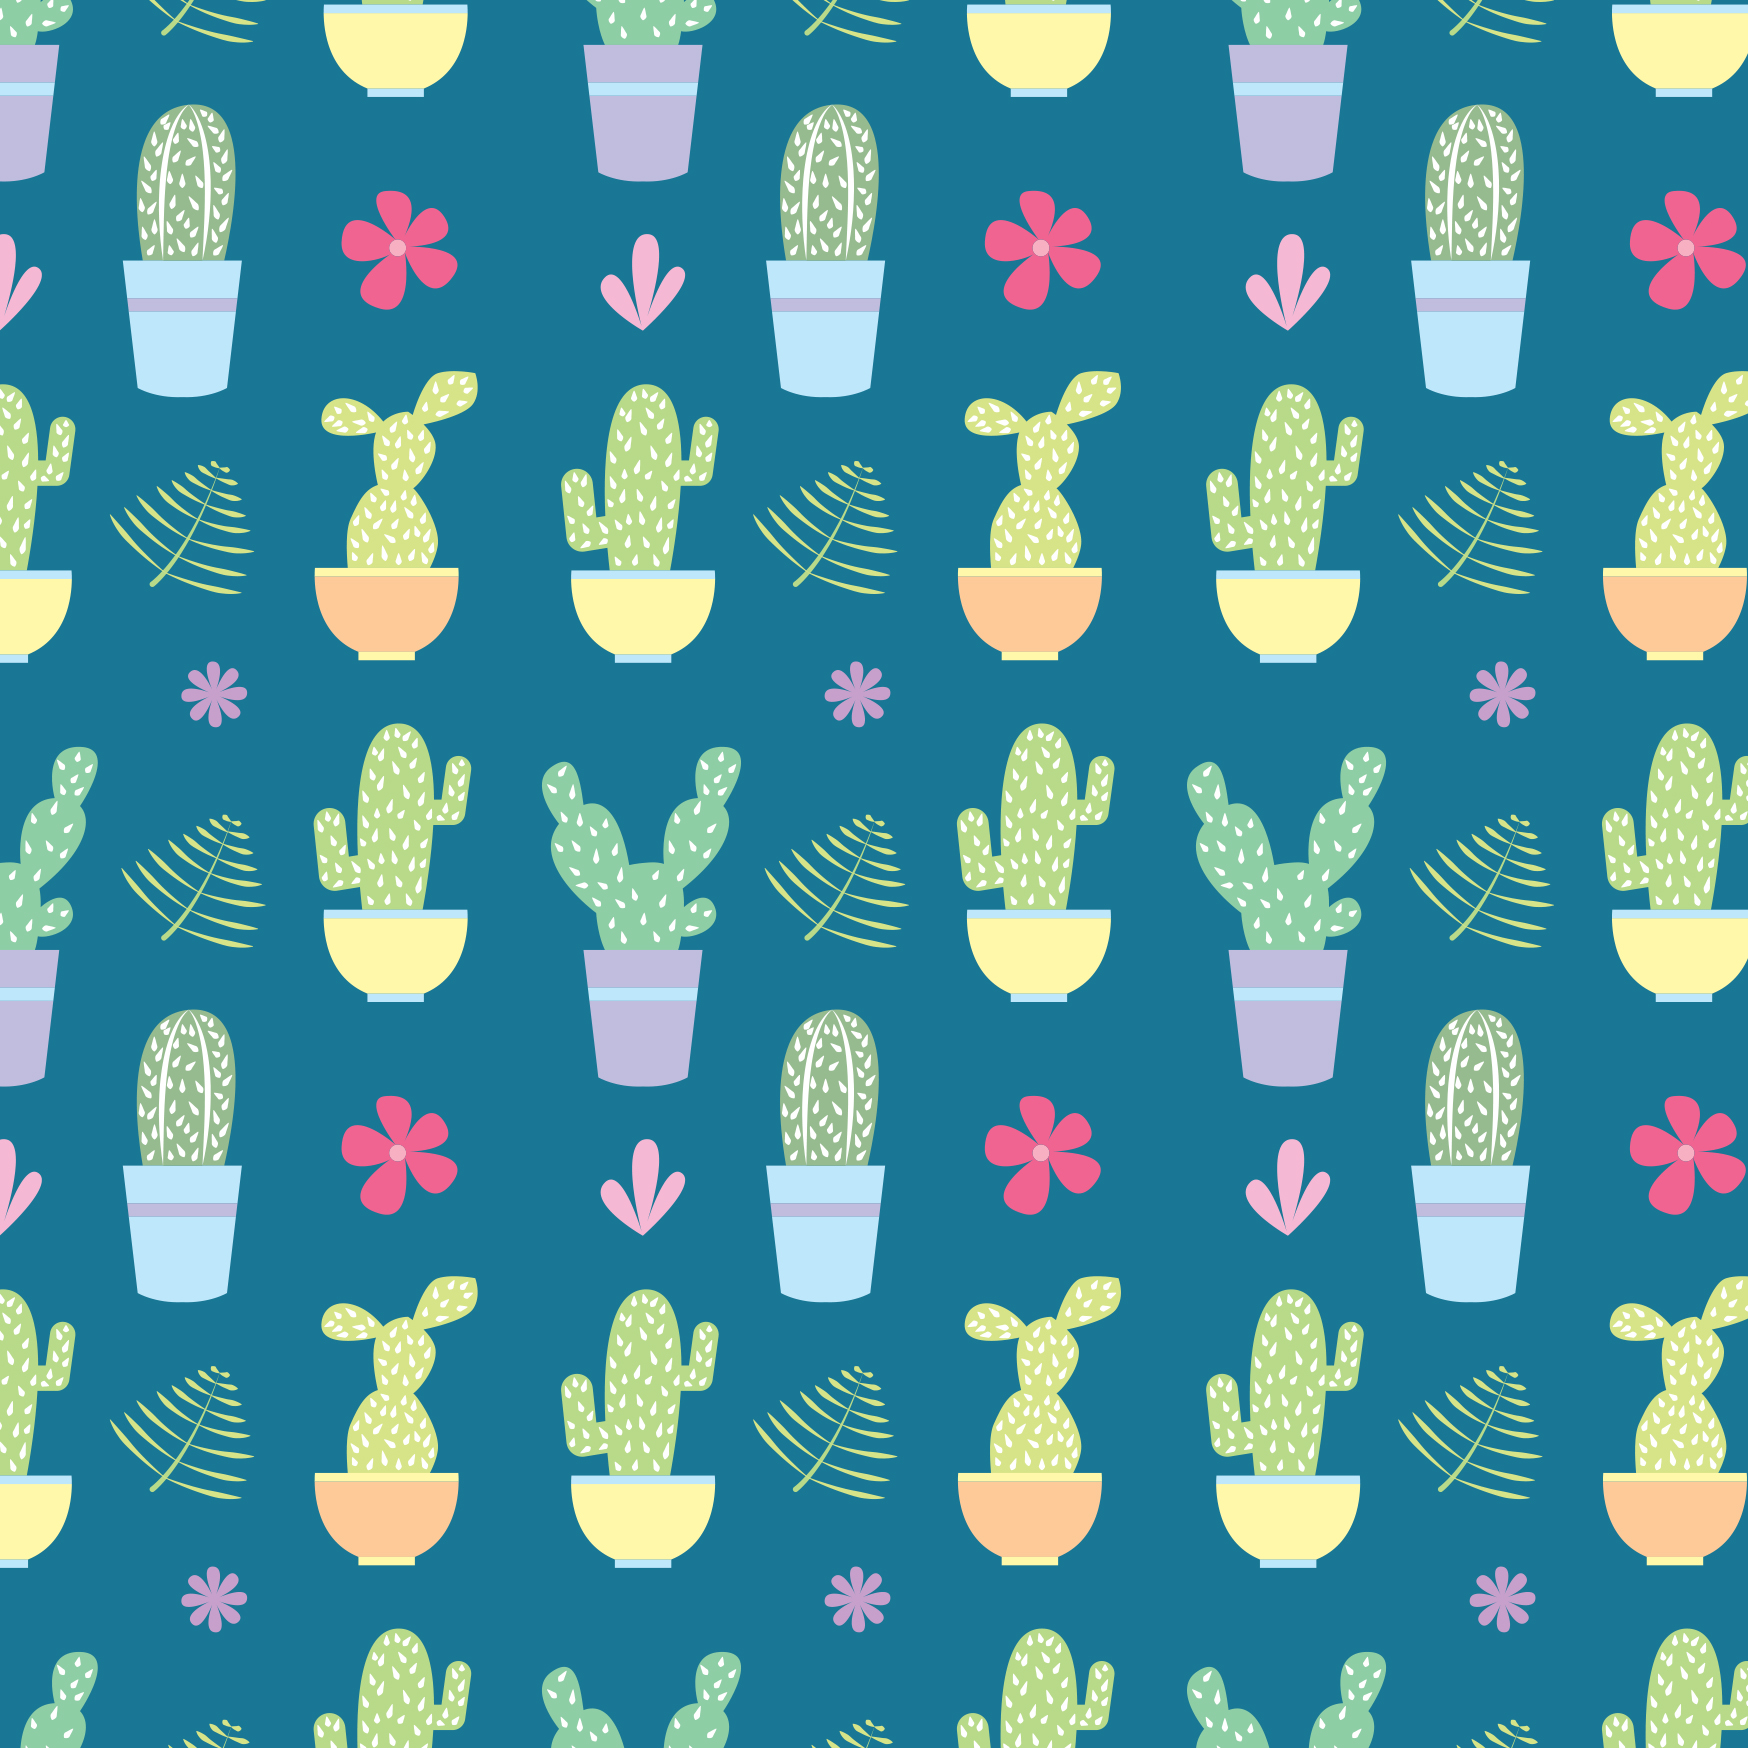 cactus pattern.jpg